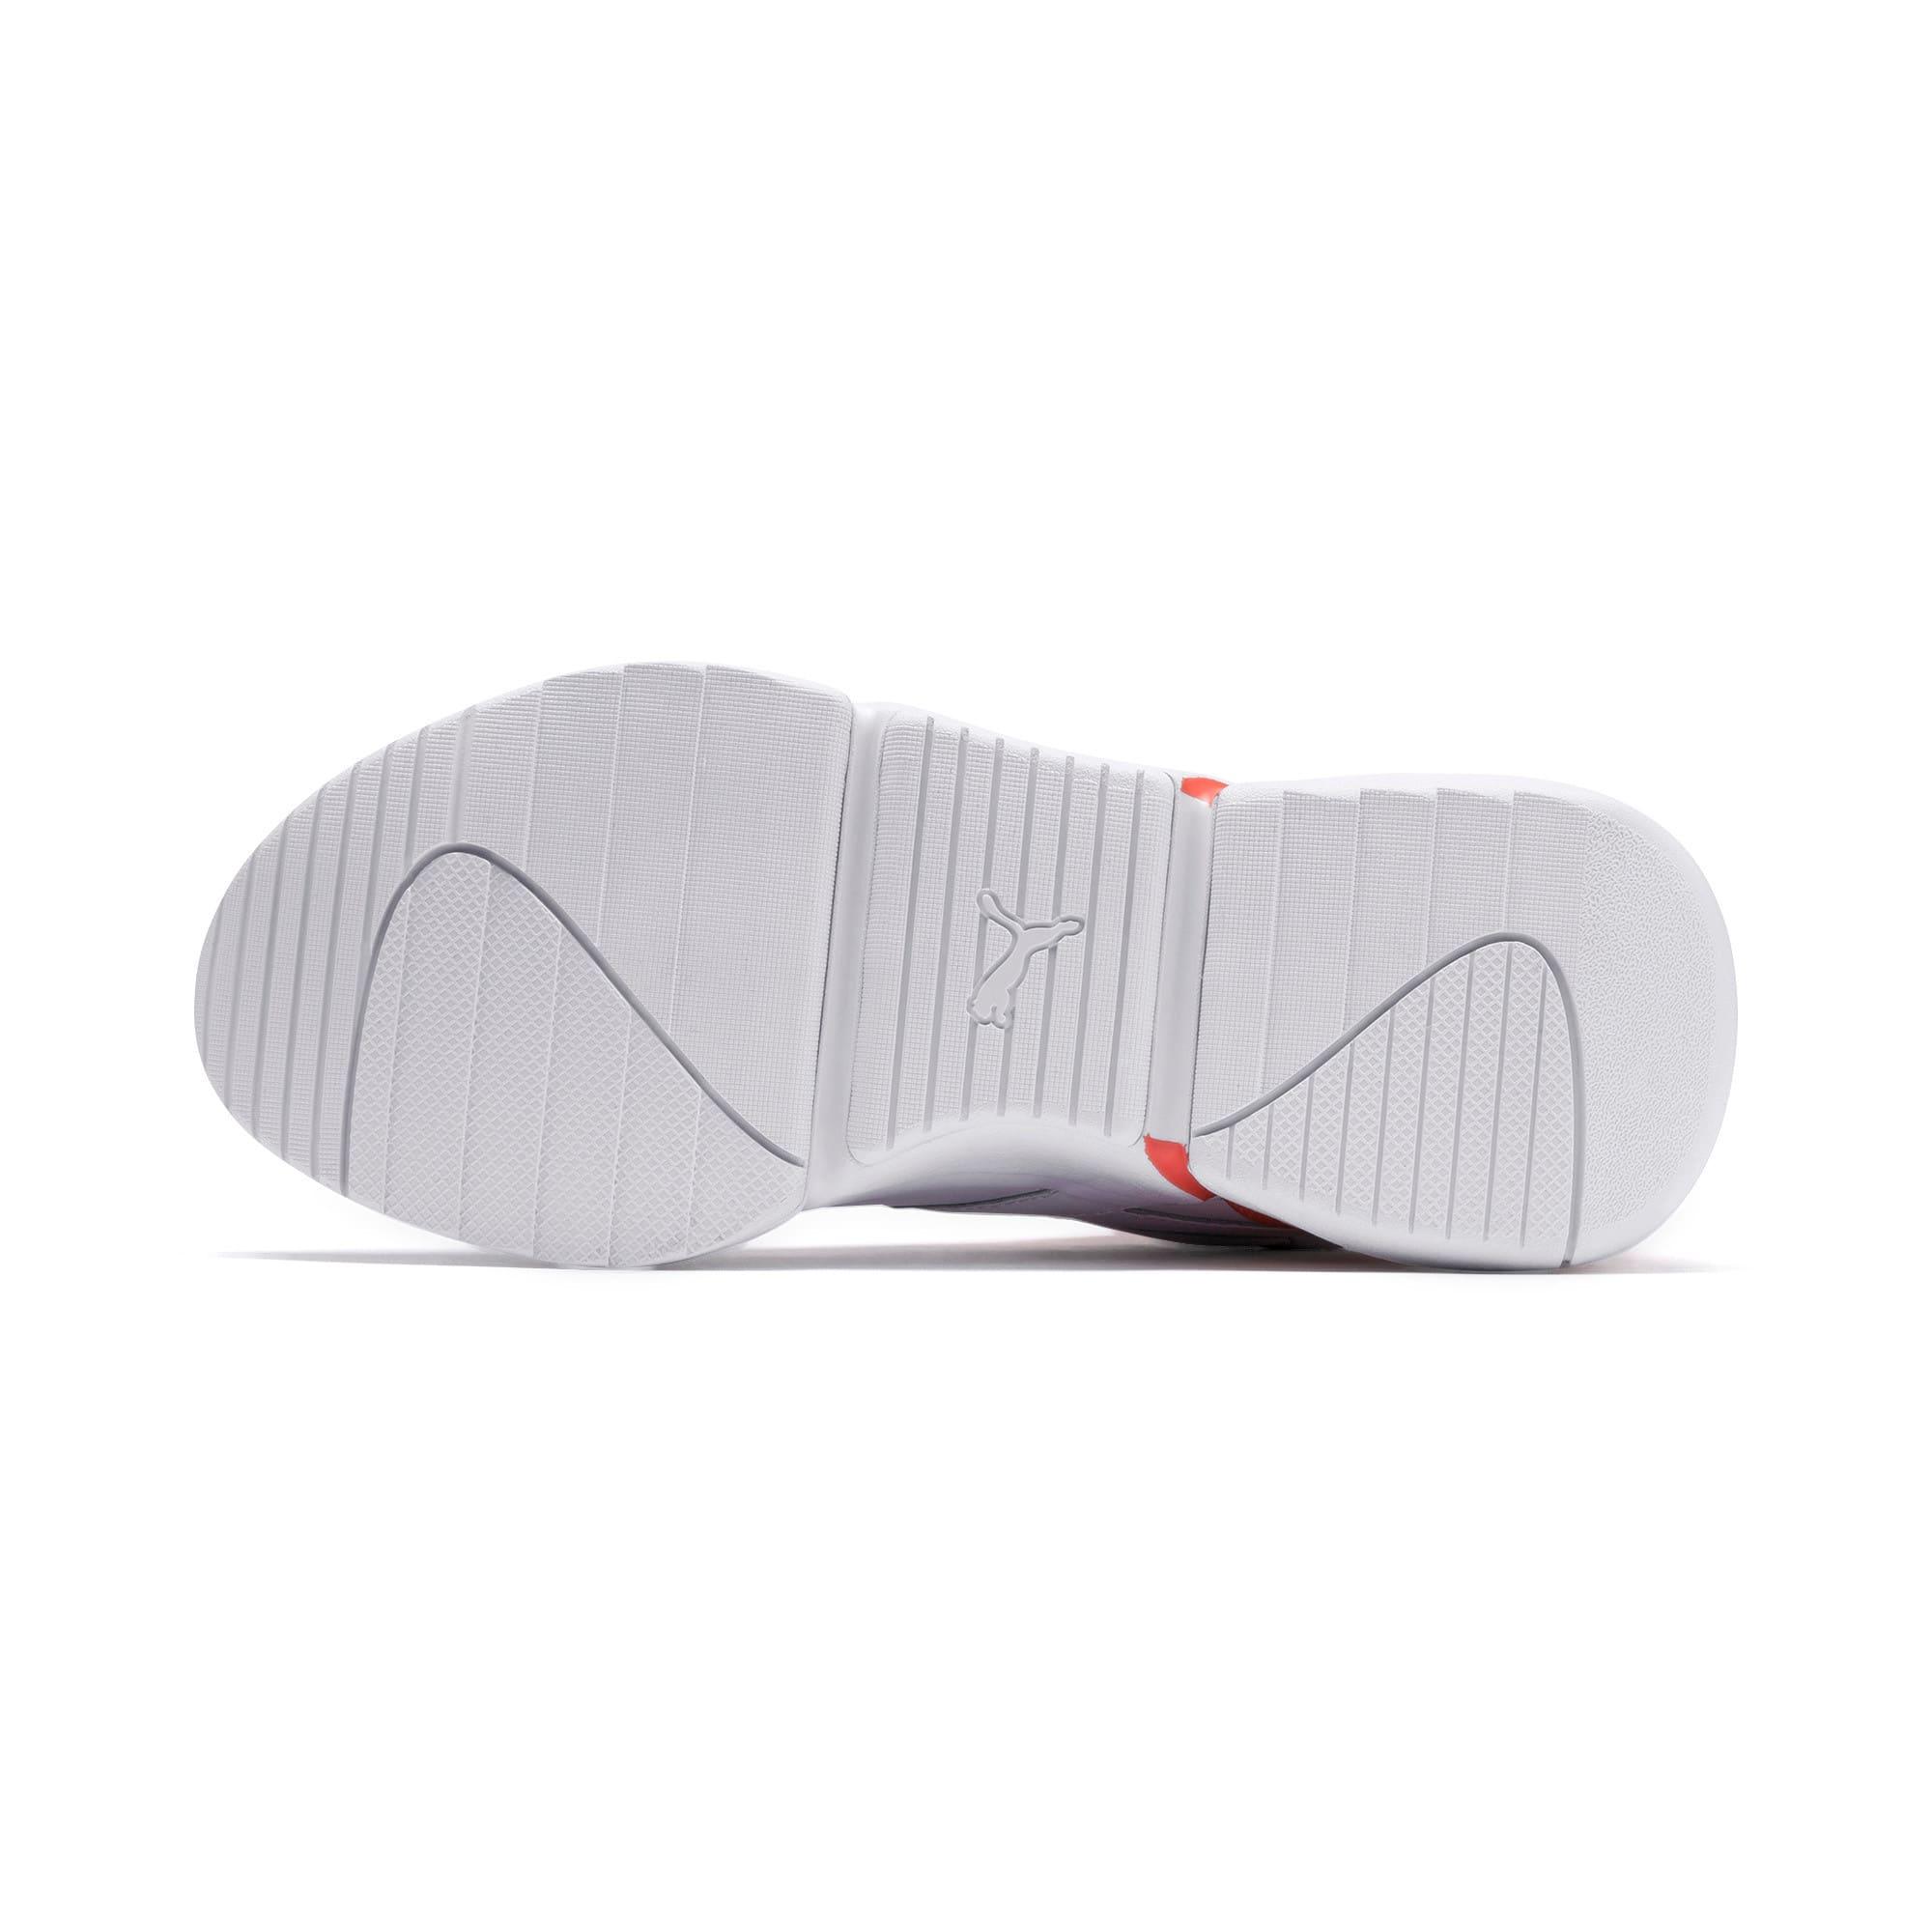 Thumbnail 4 of Nova x Pantone 2 Women's Sneakers, Puma White-Living Coral, medium